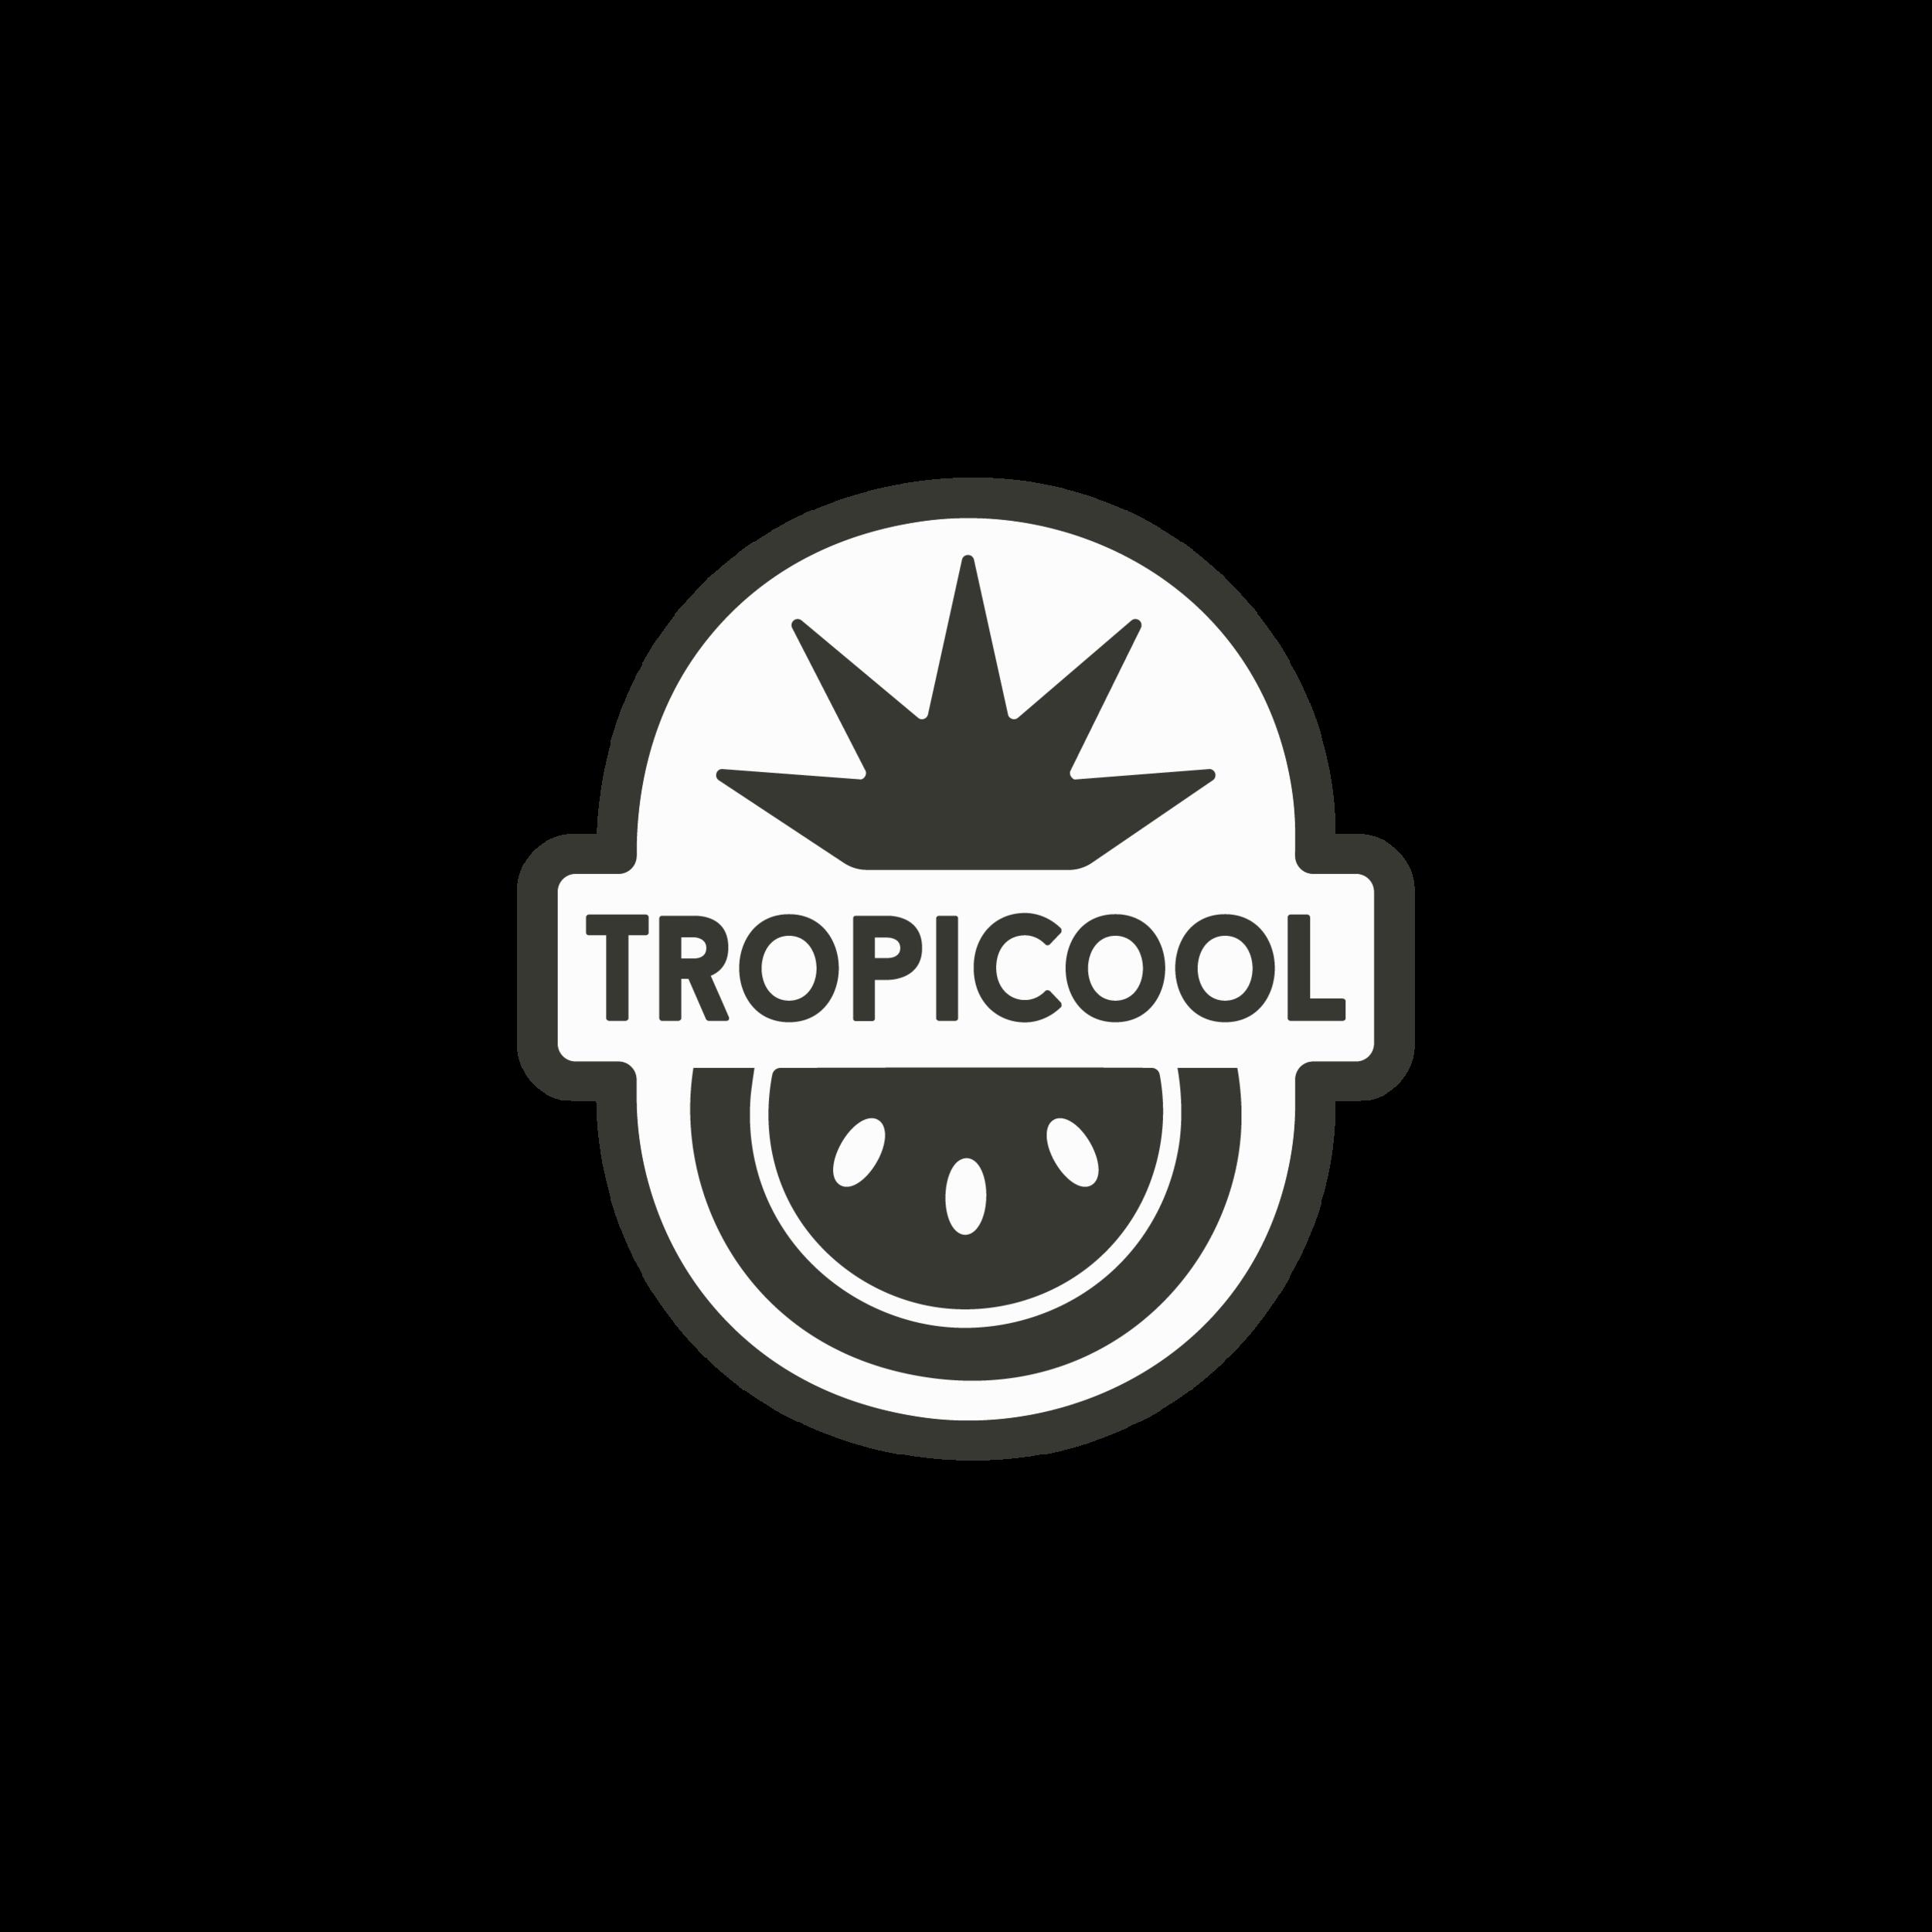 Tropicool@2x.png